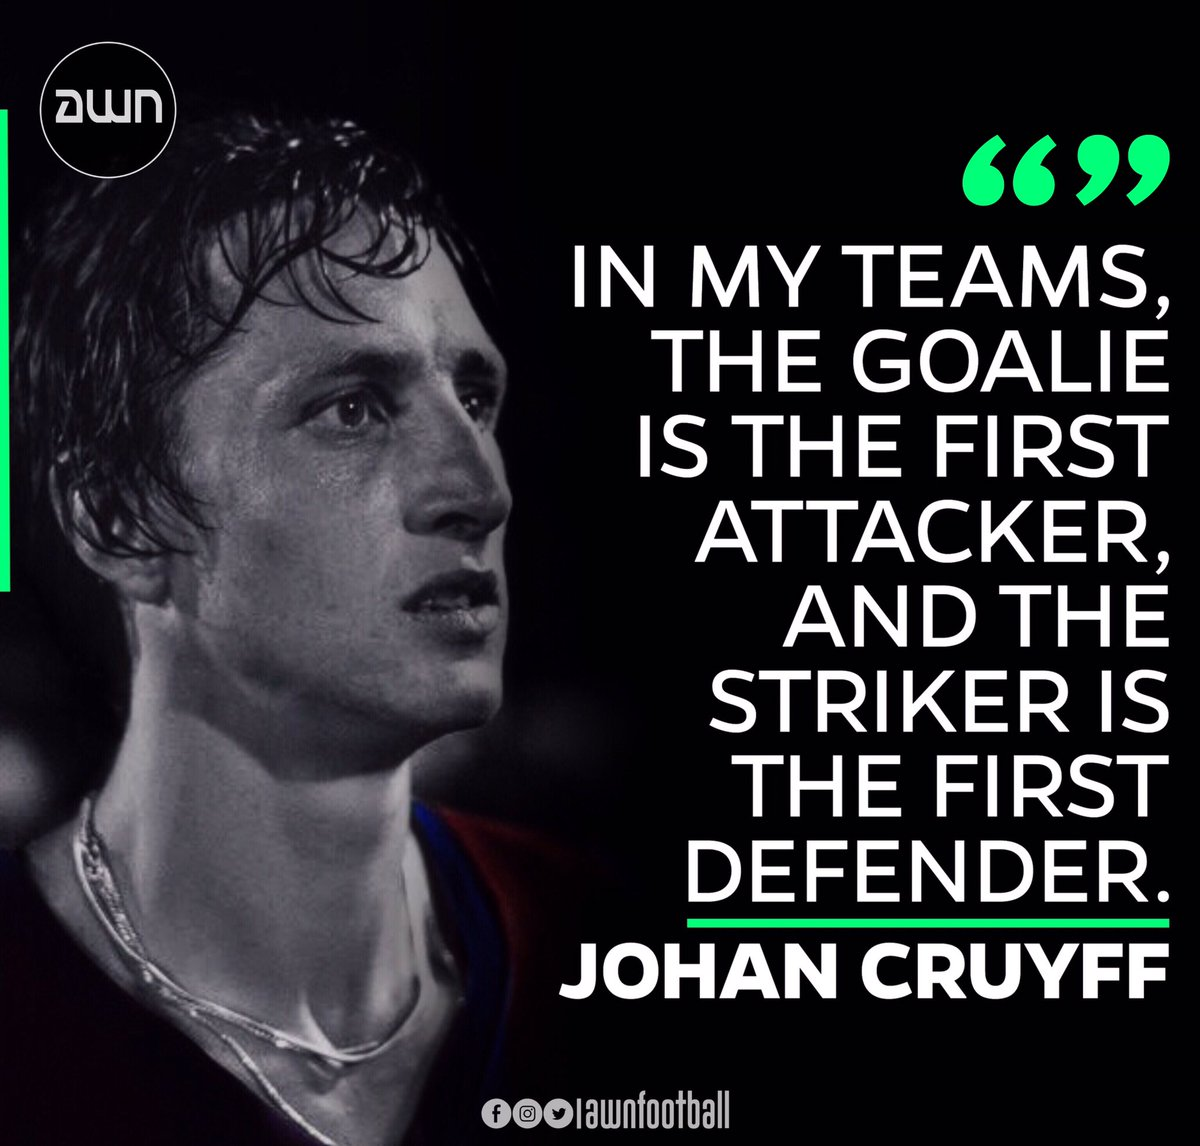 @JohanCruyff ❤️ . #fcbarcelona #barcelonafans #barcelona🇪🇸 #barcelona #goal #fcbarcelonafans #fcbayern #realmadrid #messico #messi10 #messigoal #terstegen #messi #messifans #sports #viscaelbarça #coutinho #adidas #nike #footballquotes #soccermemes #footballmemes #campnou